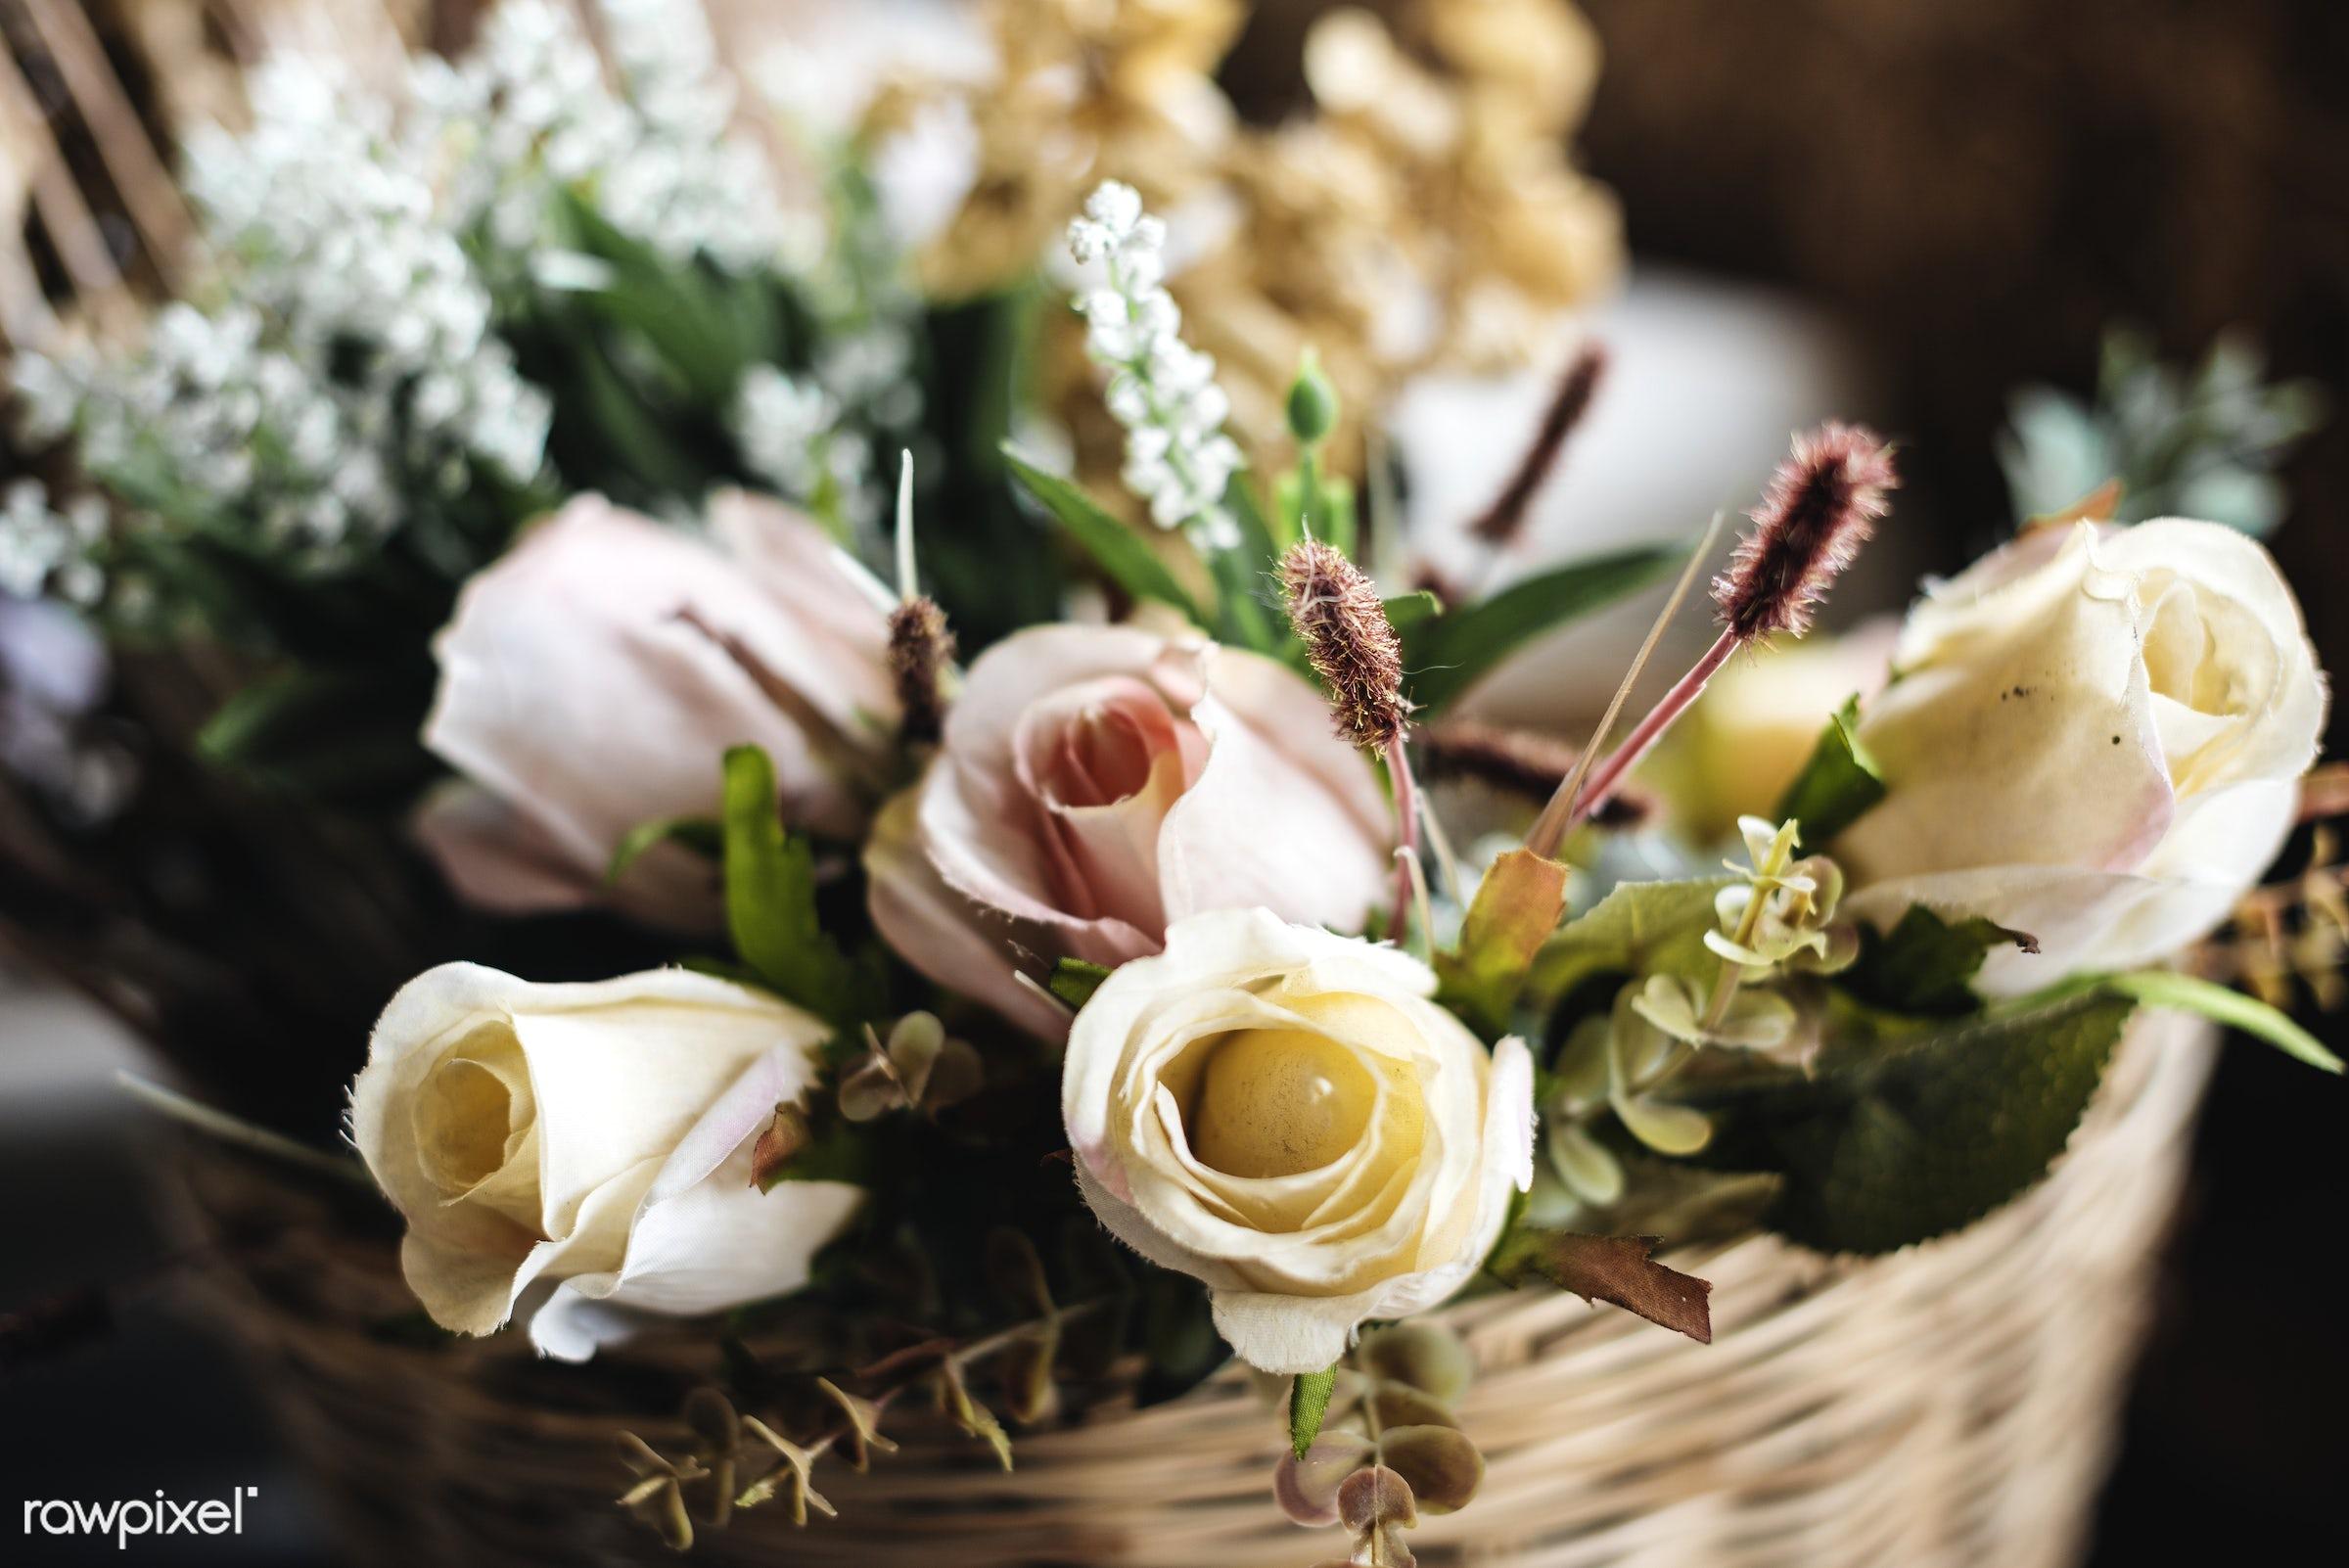 Fresh Roses Flowers Arrangement Decorative - rose, floral, arrangement, attractive, beautiful, bloom, blooming, blossom,...